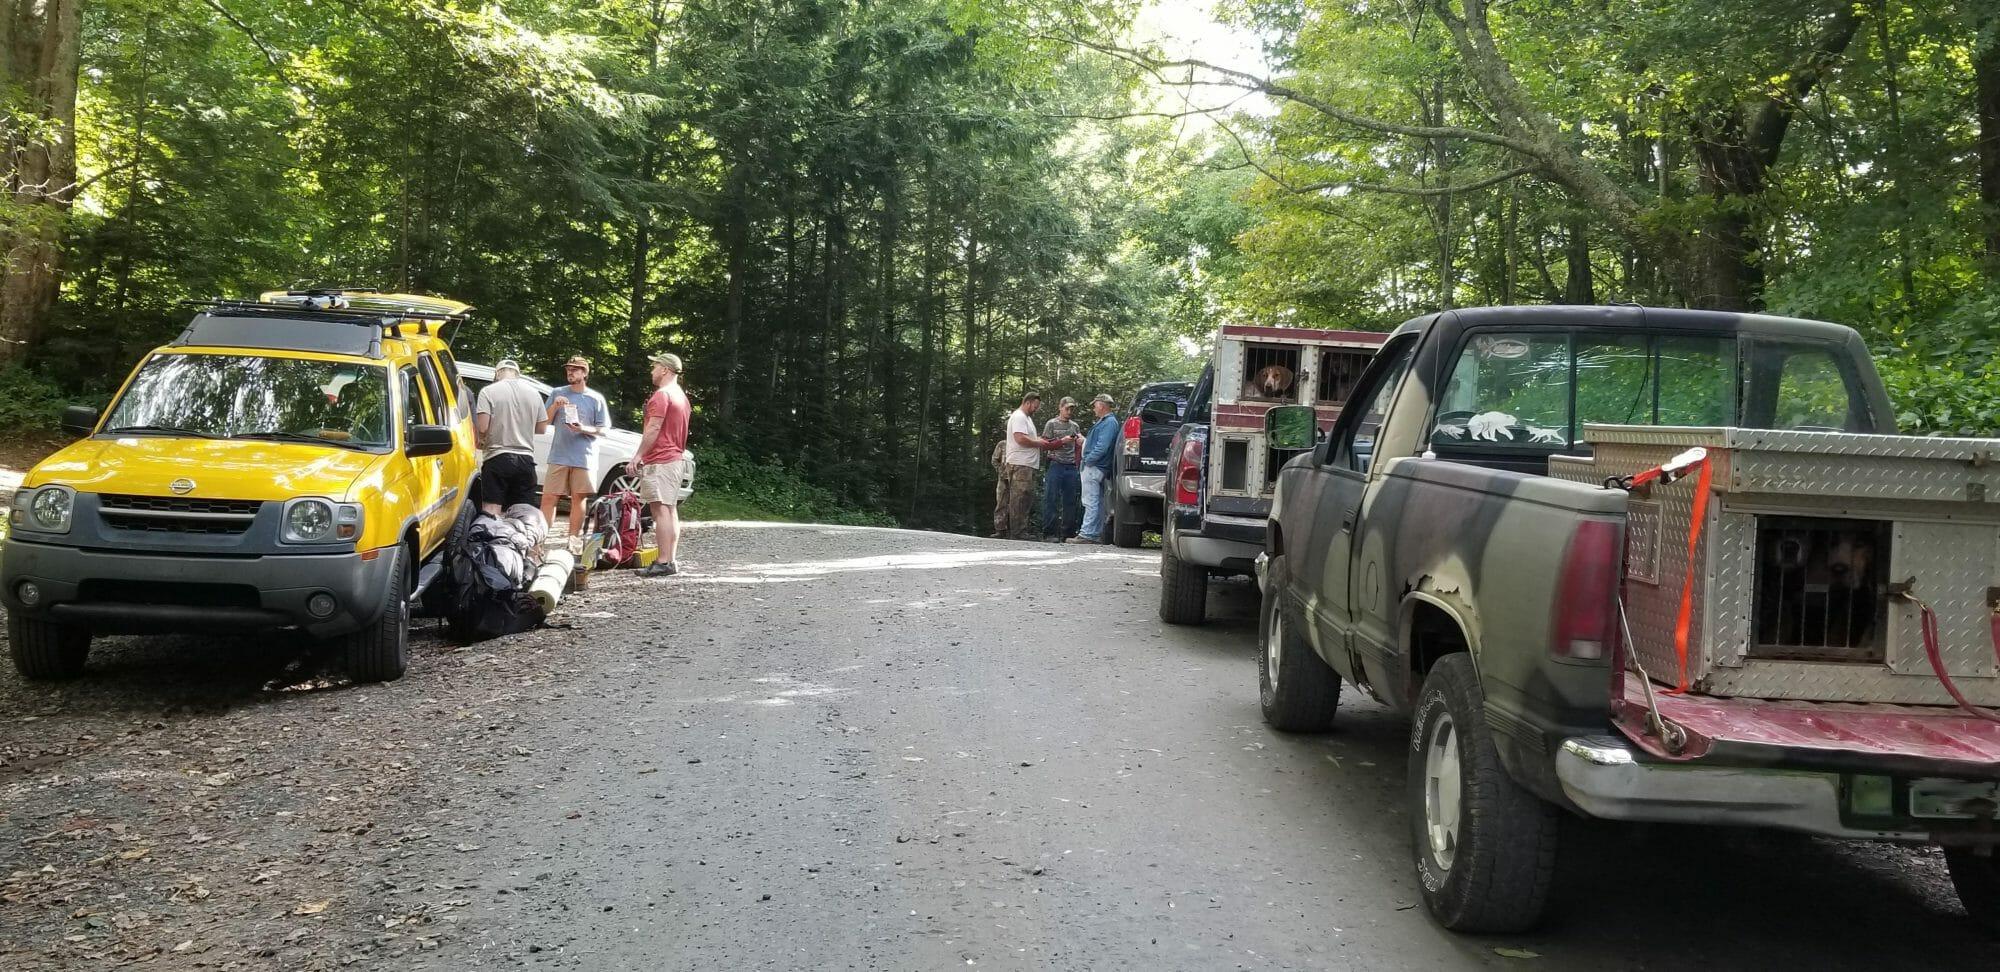 What Chris McCurry, Bark House, sees at Appalachian Trailhead